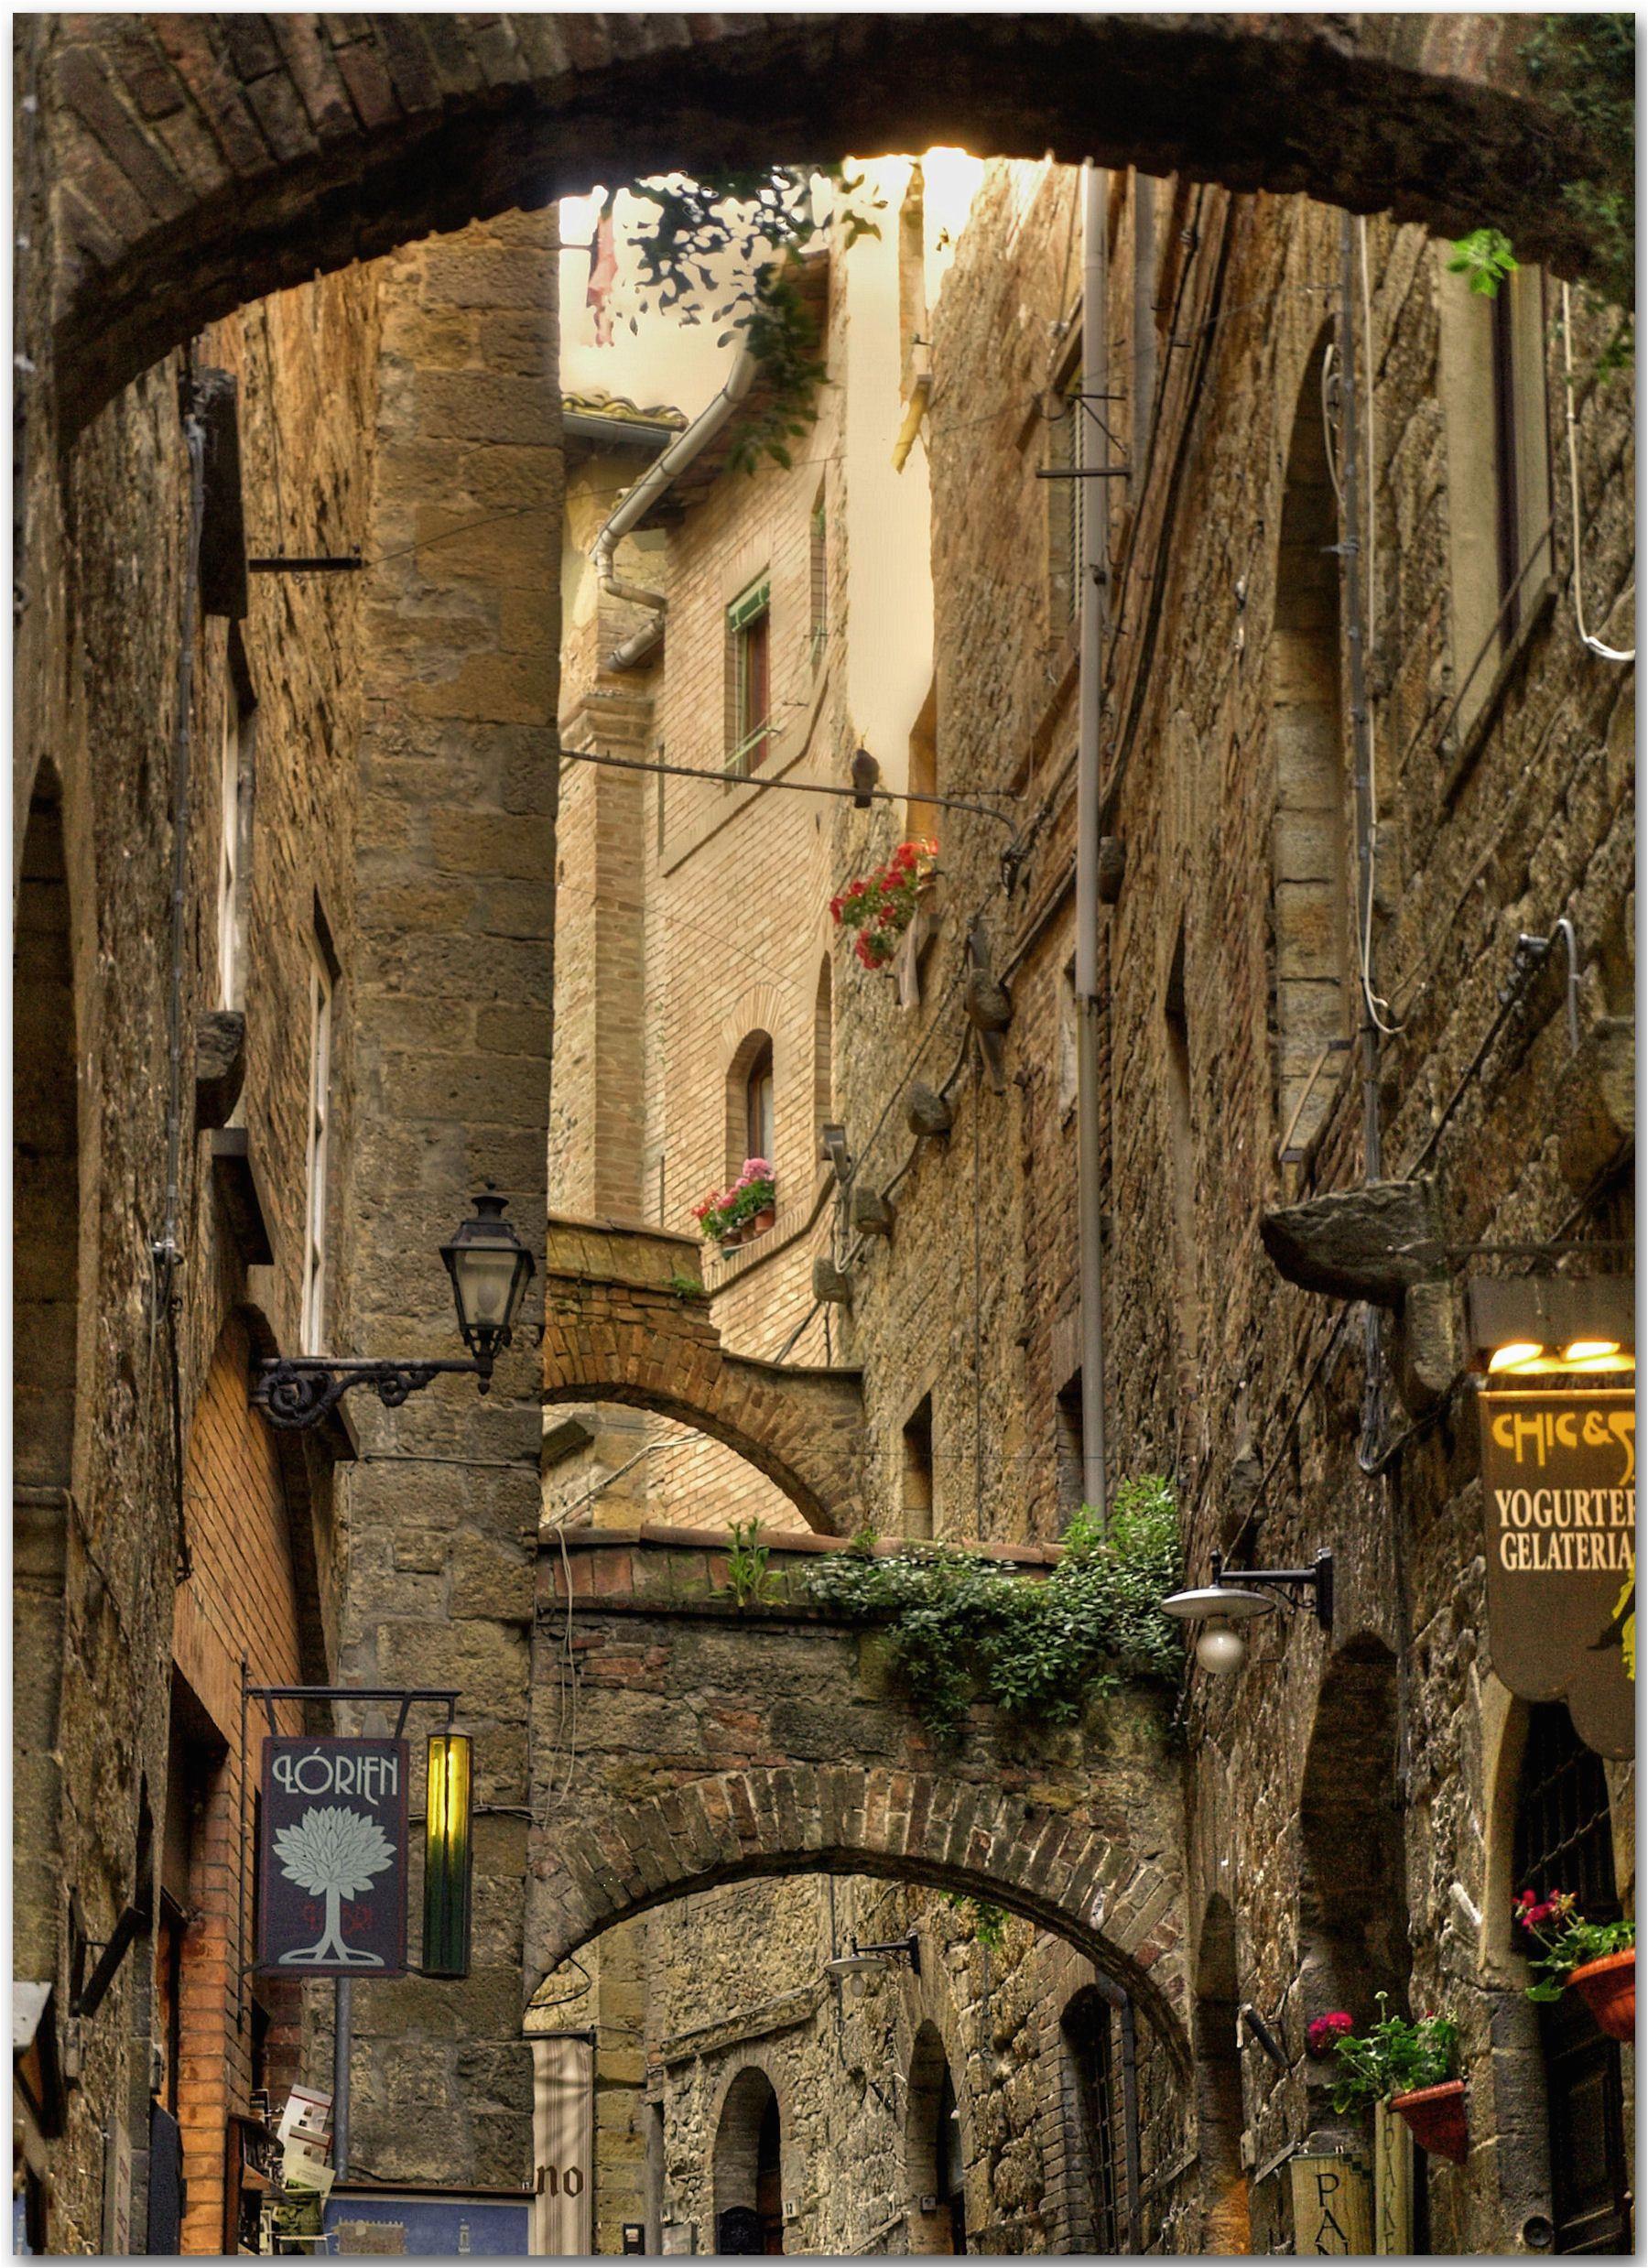 volterra tuscany italy charming small alley near the piazza dei